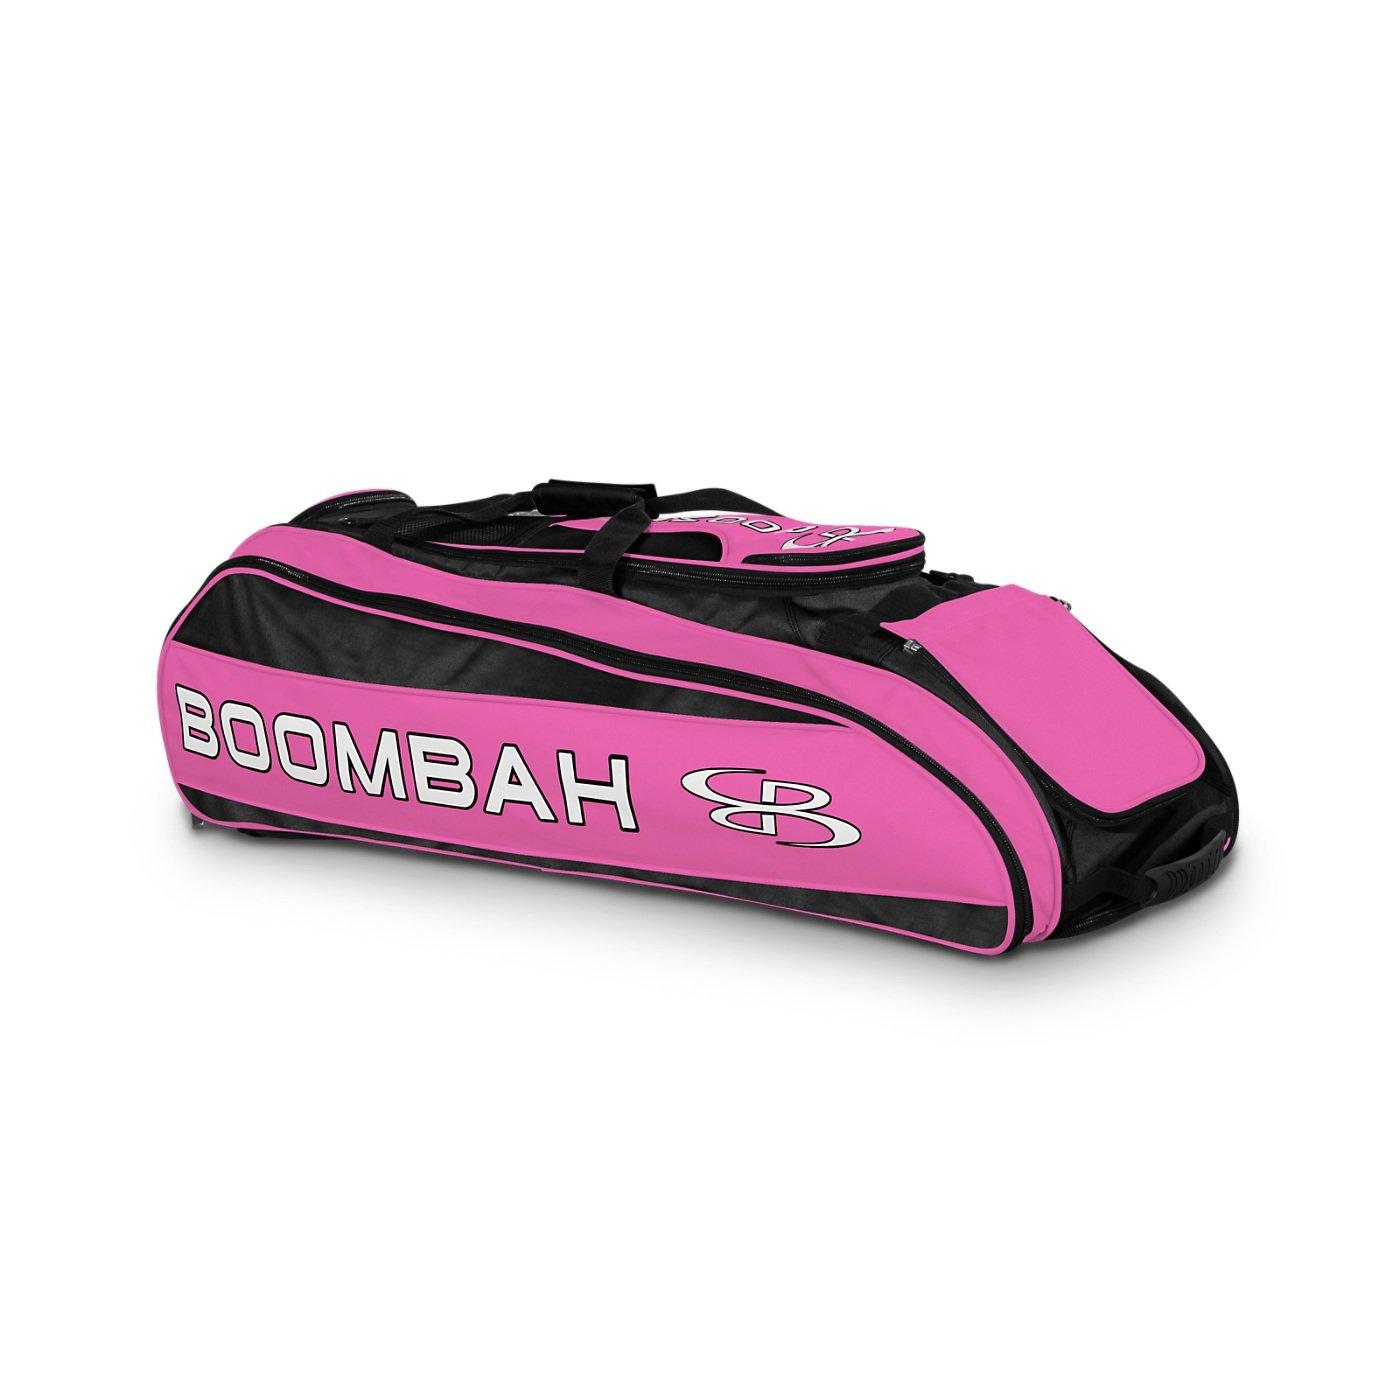 Boombah Beast Baseball/Softball Bat Bag - 40'' x 14'' x 13'' - Black/Pink - Holds 8 Bats, Glove & Shoe Compartments by Boombah (Image #1)